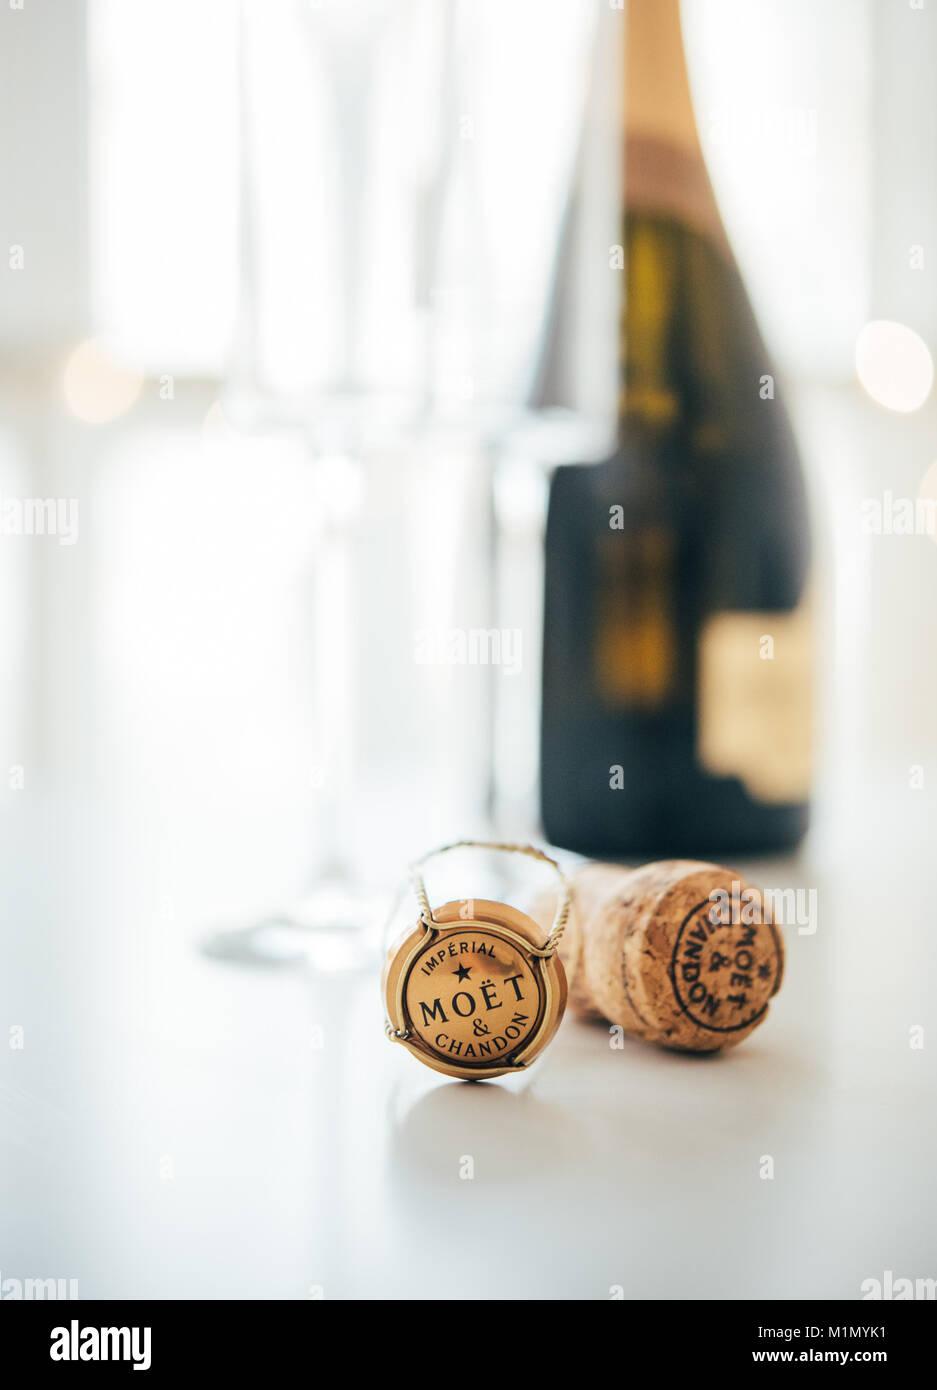 ODESSA, Ukraine - 30 janvier 2018: bouchon de champagne Moët & Chandon Photo Stock